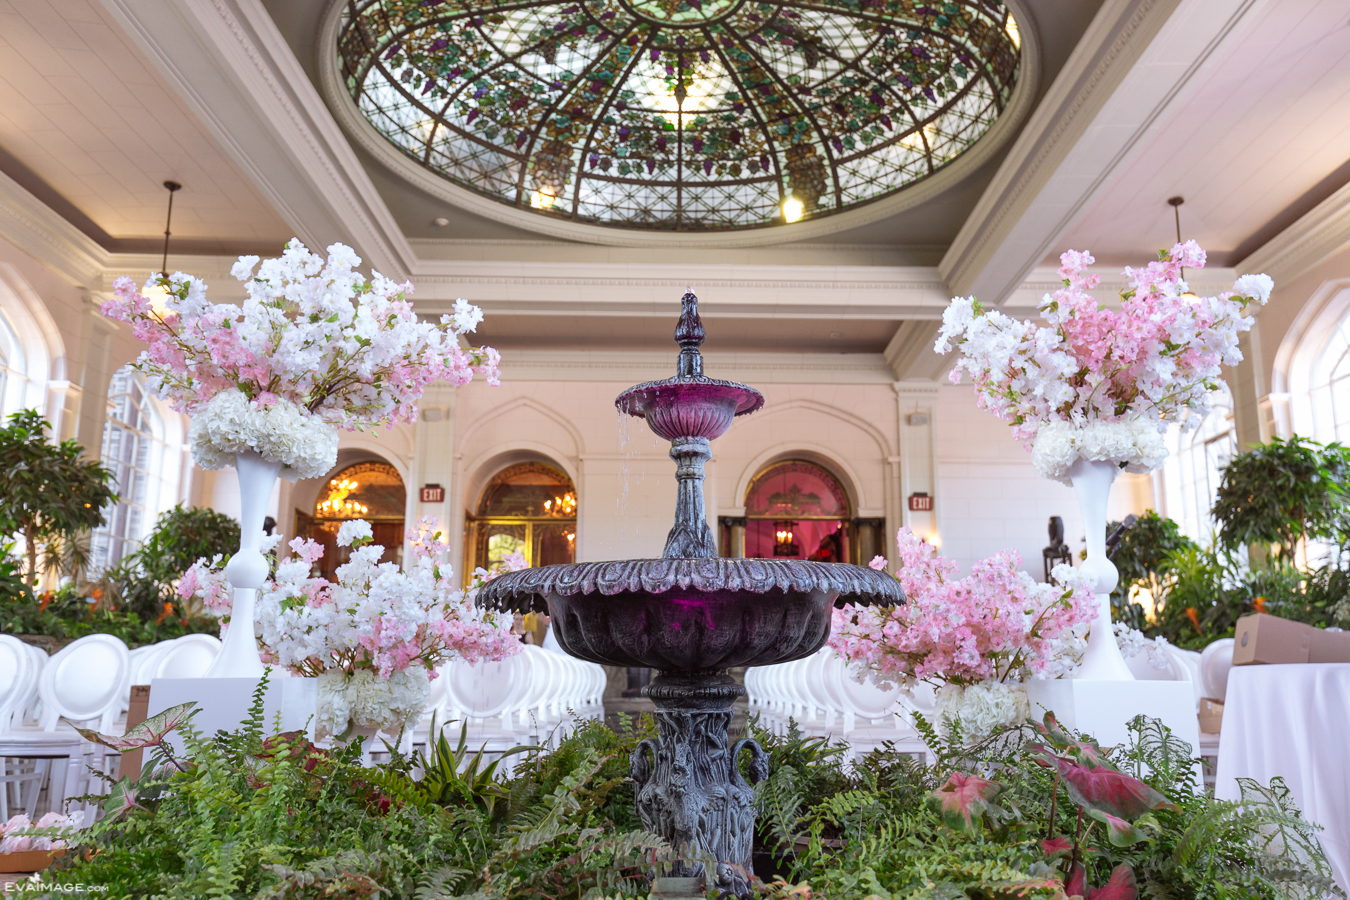 Casa Loma Summer Wedding Toronto EvaImage Peppermint Weddings www.evaimage.com www.peppermintweddings.ca